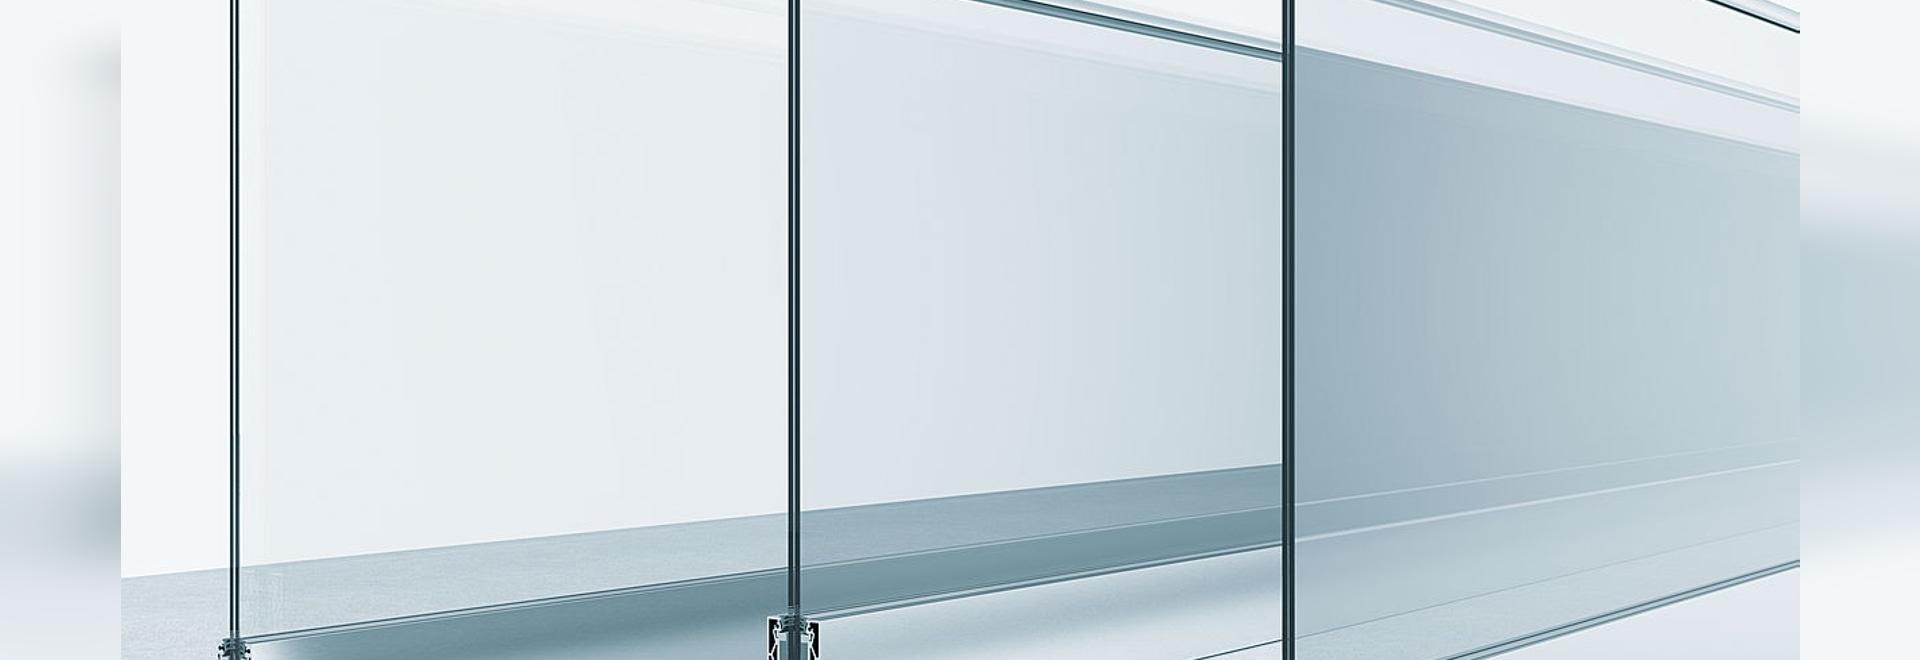 Railing system for cantilevered glass balustrades